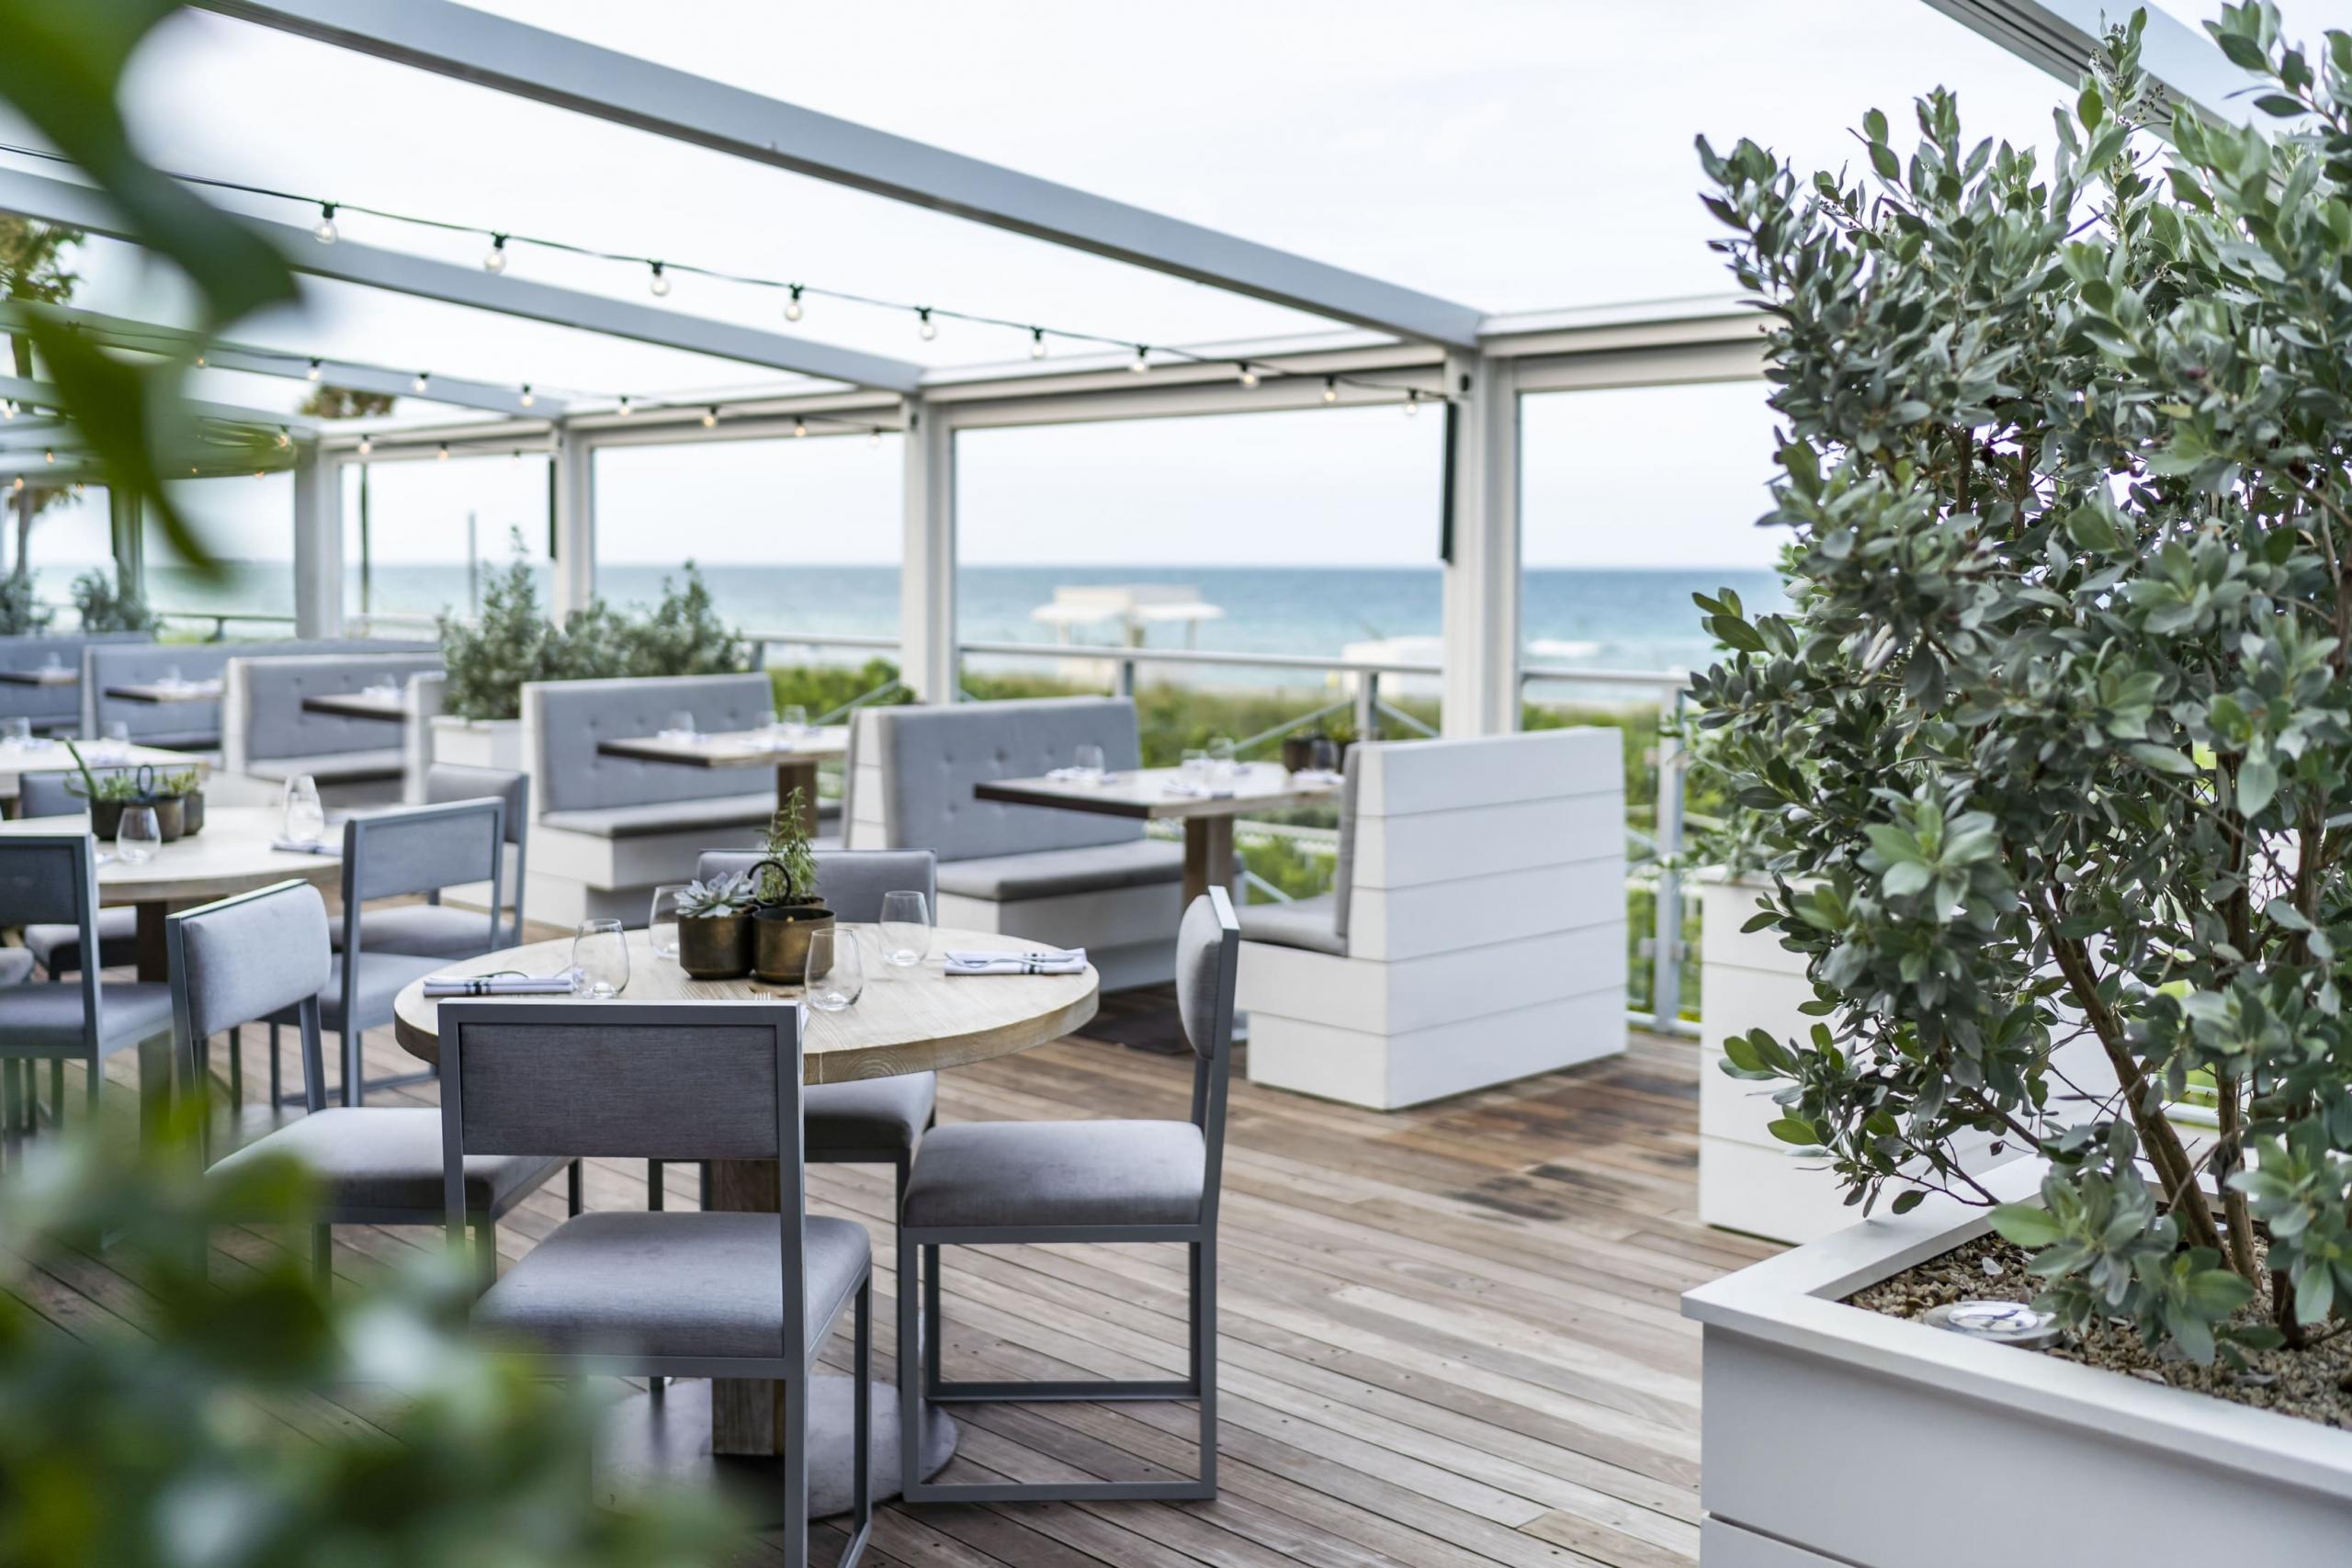 Restaurant Balcony with ocean view